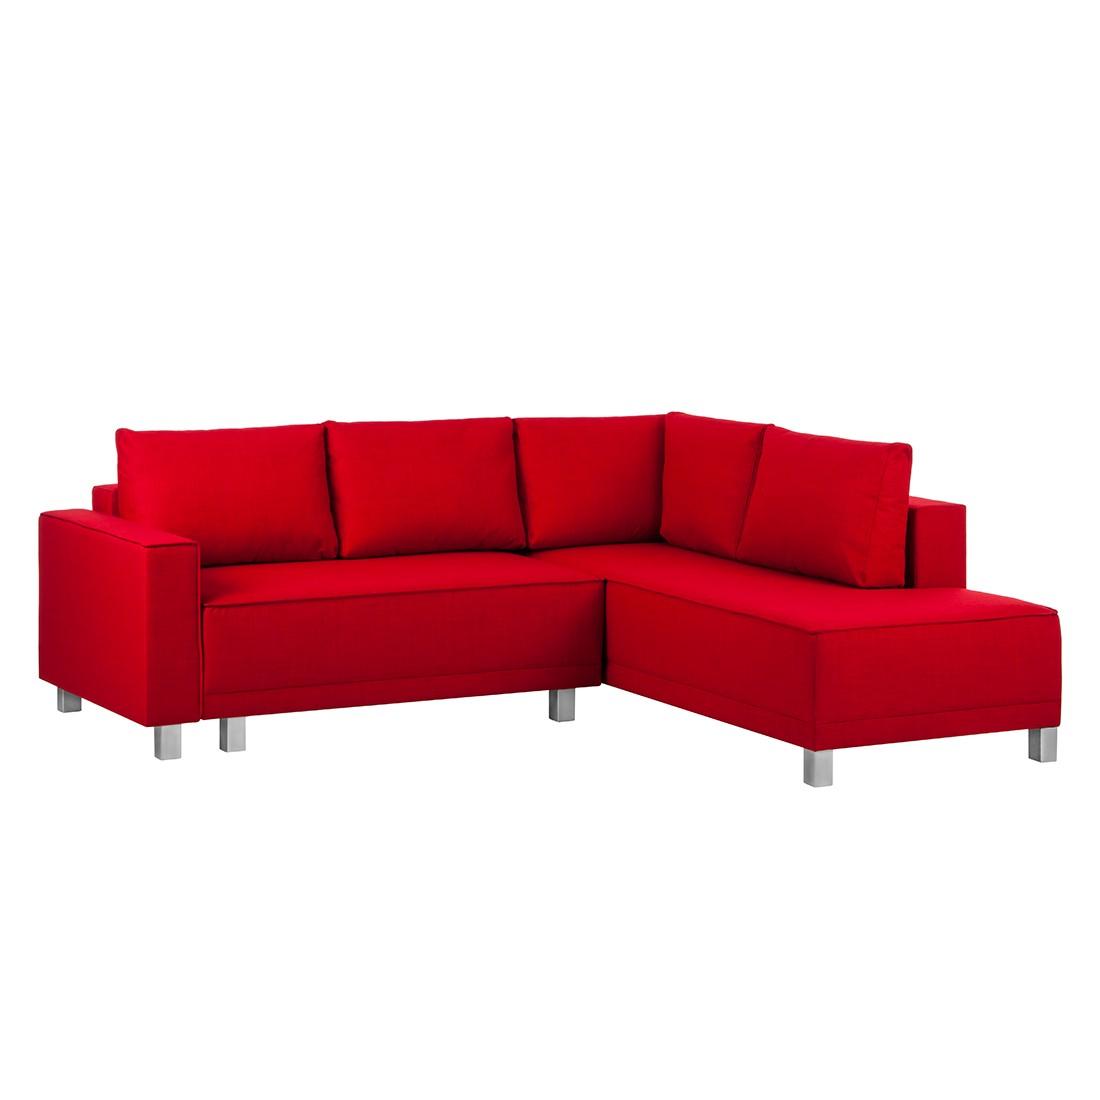 ecksofa stockholm mit schlaffunktion strukturstoff rot ottomane davorstehend rechts. Black Bedroom Furniture Sets. Home Design Ideas